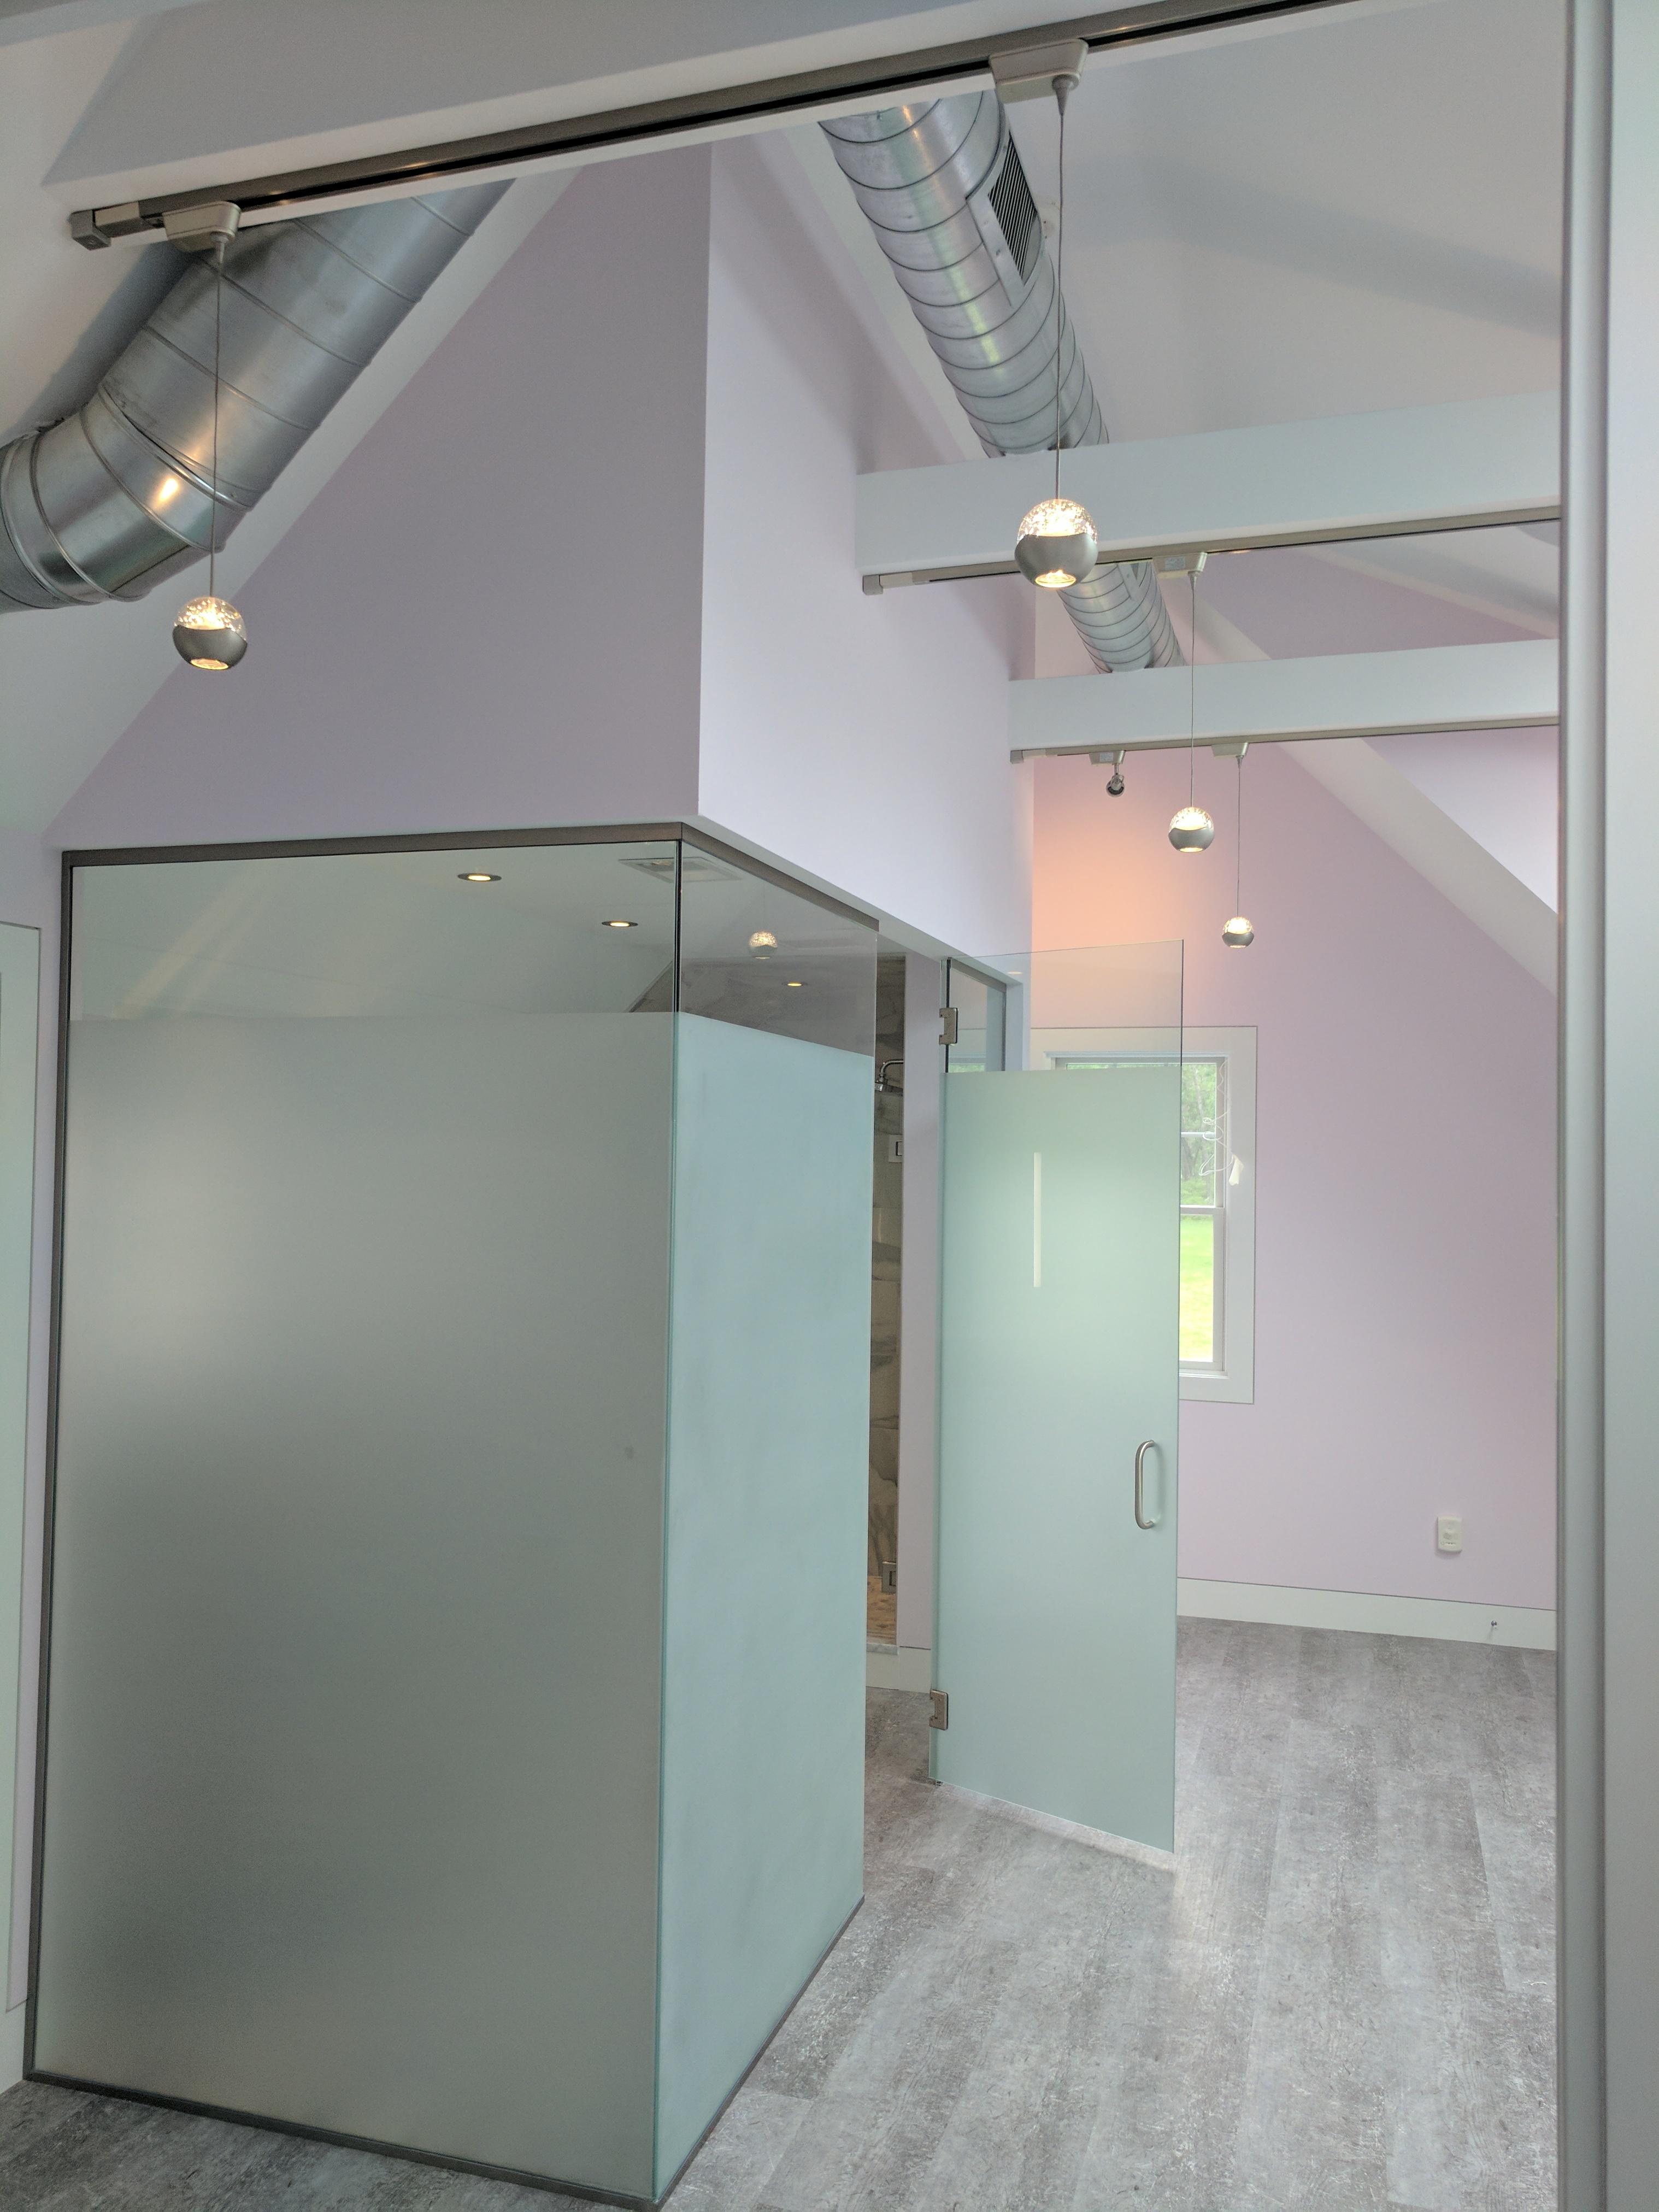 REEF Custom Builders, Contemporary Design, Renovation, Remodeling, Glass Walls